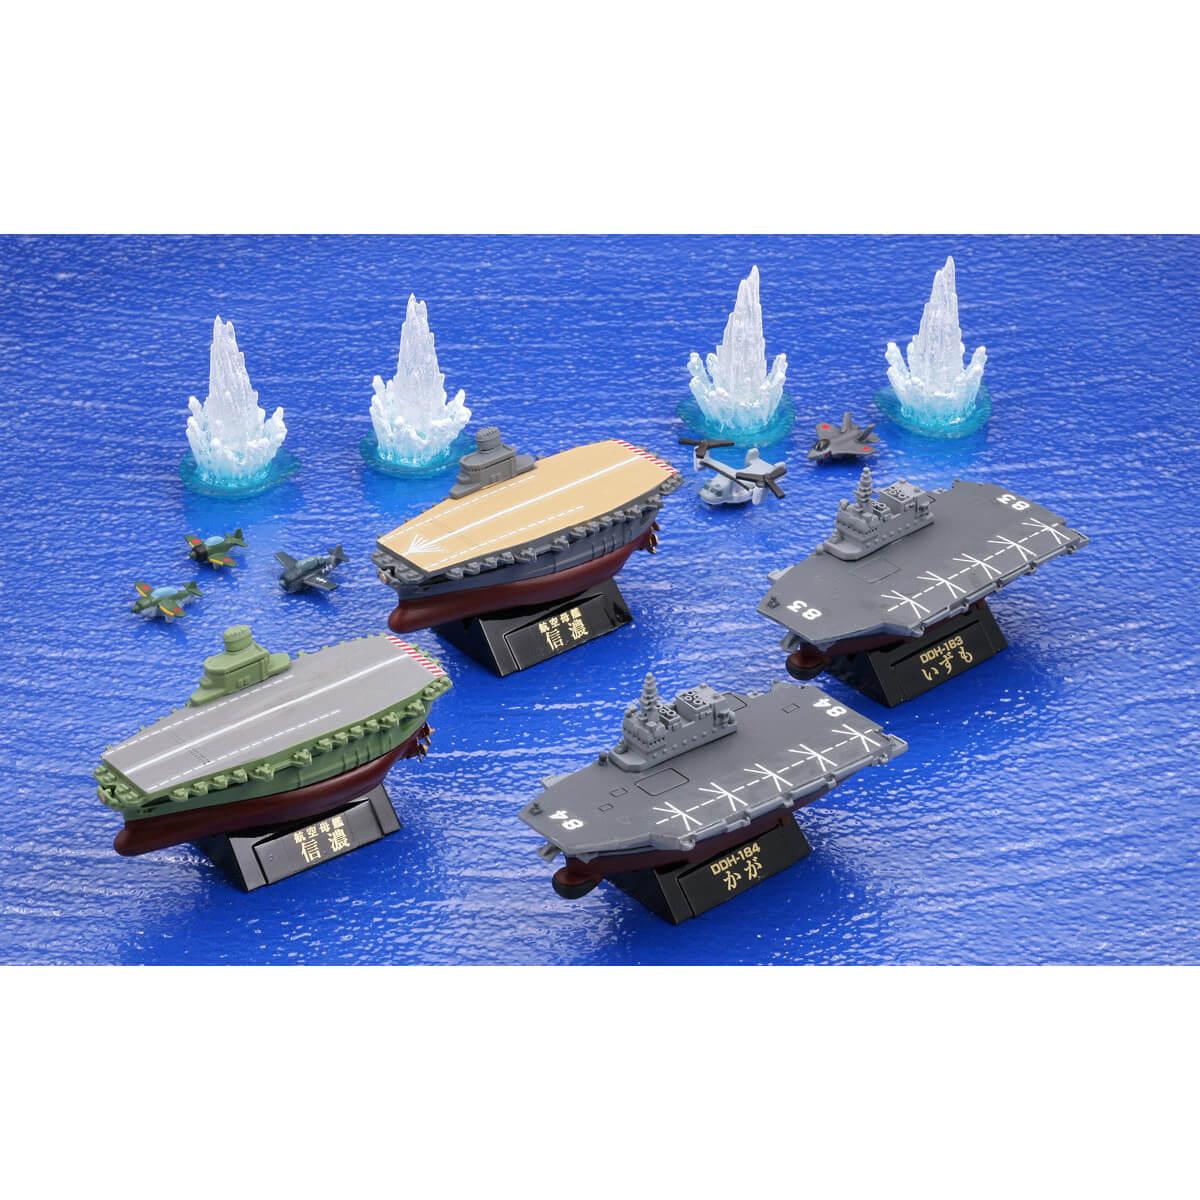 KAIYODO / 扭蛋 / 世界戰艦3 / 信濃&護衛艦編 / 全6款 / 大全 / *6